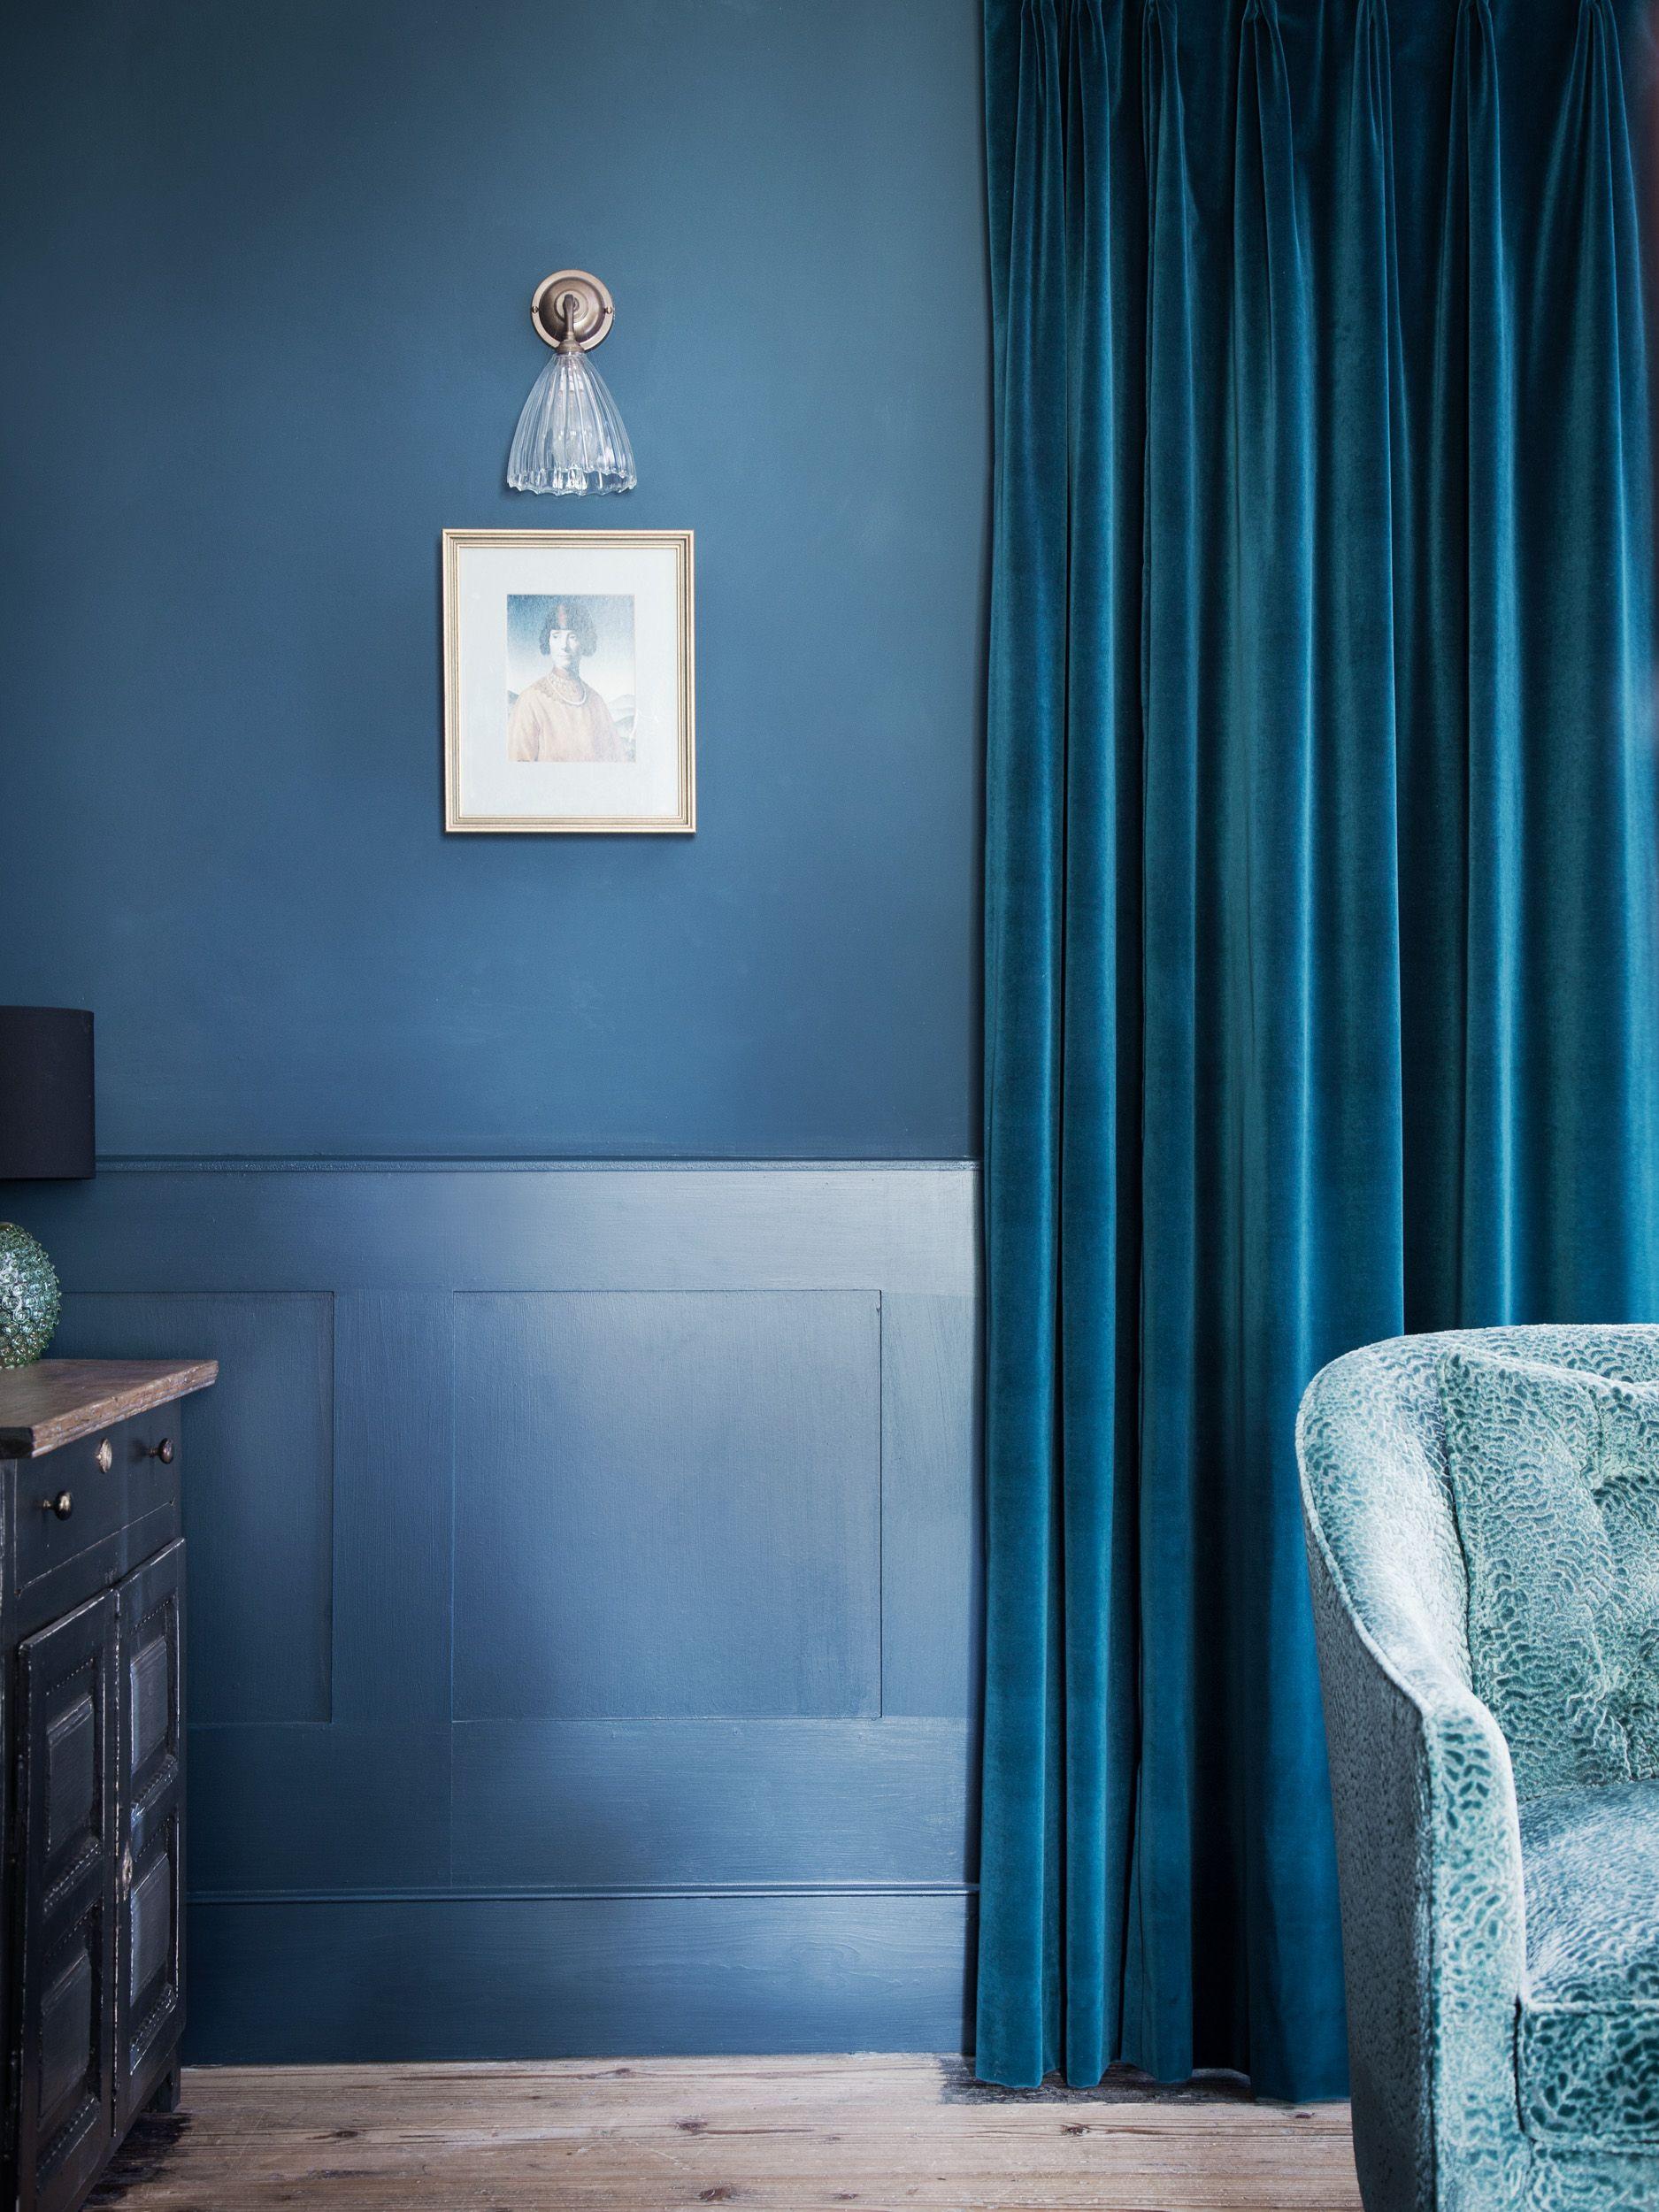 curtain design sheer valance itm curtains bedroom blue pleats drape eyelets blockout drapes fabric